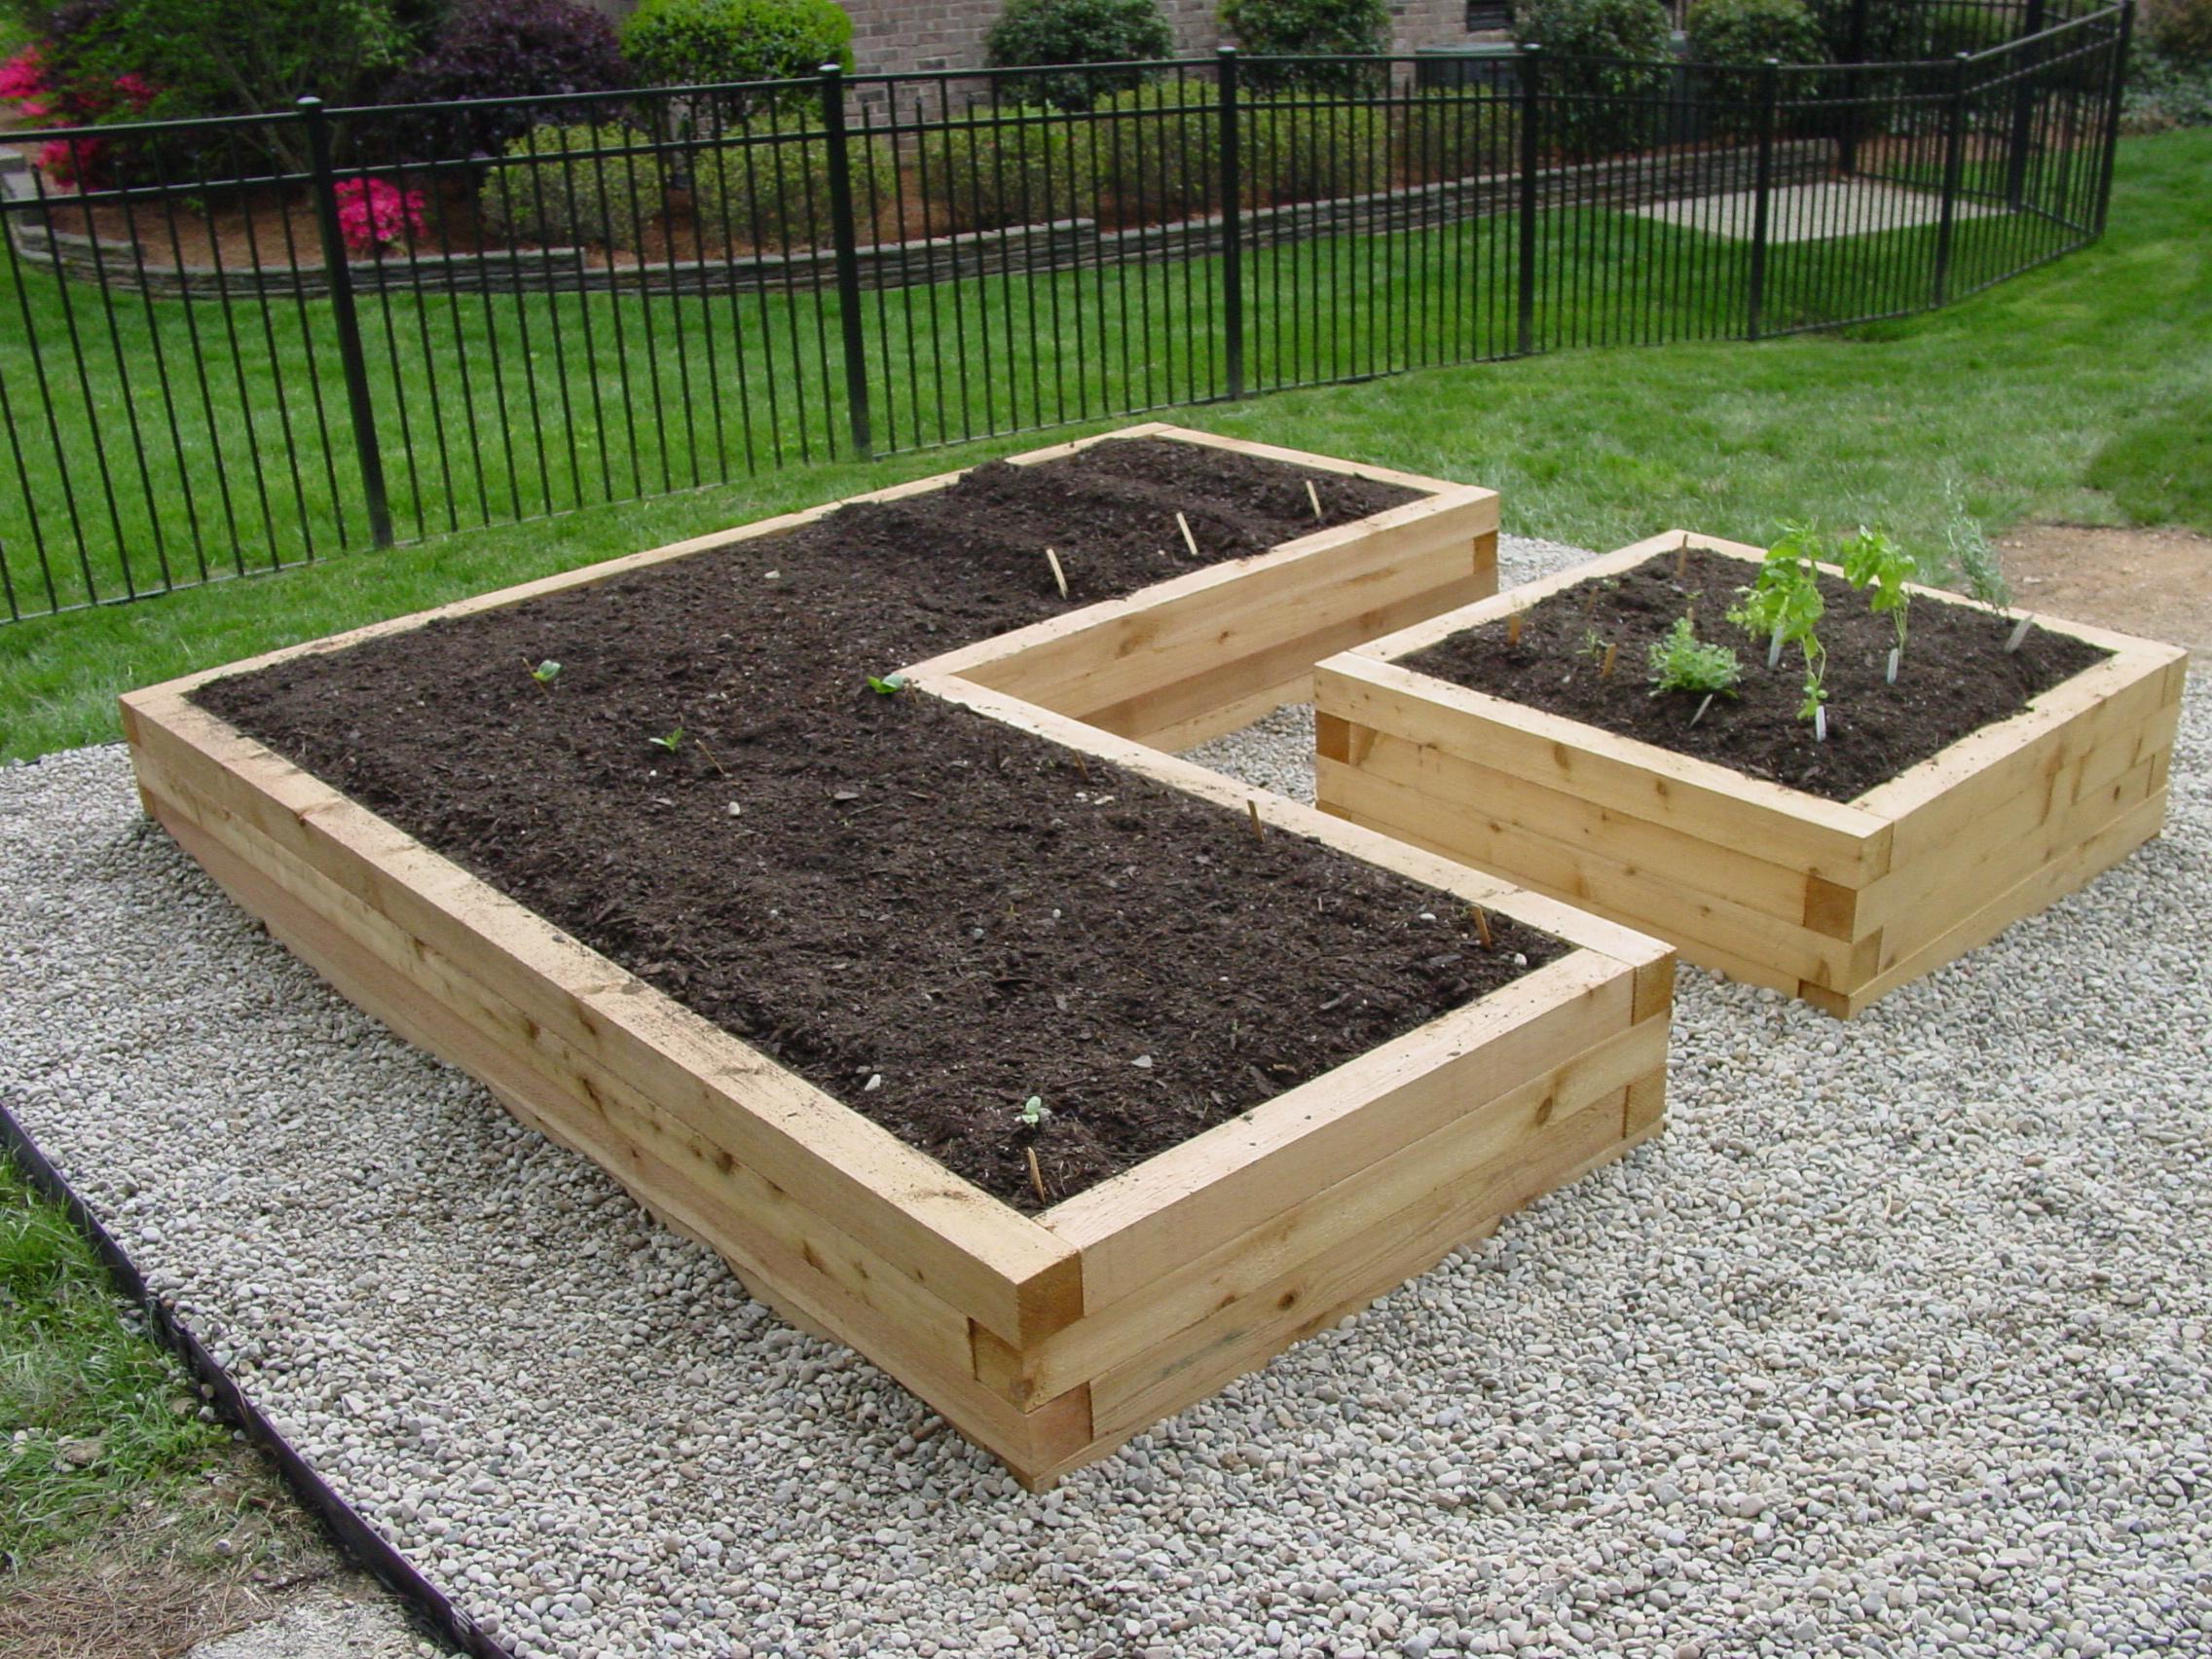 Ordinaire 1000 Ideas About Raised Garden Bed Design On Pinterest Raised Garden Beds  Raised Gardens And Vegetable